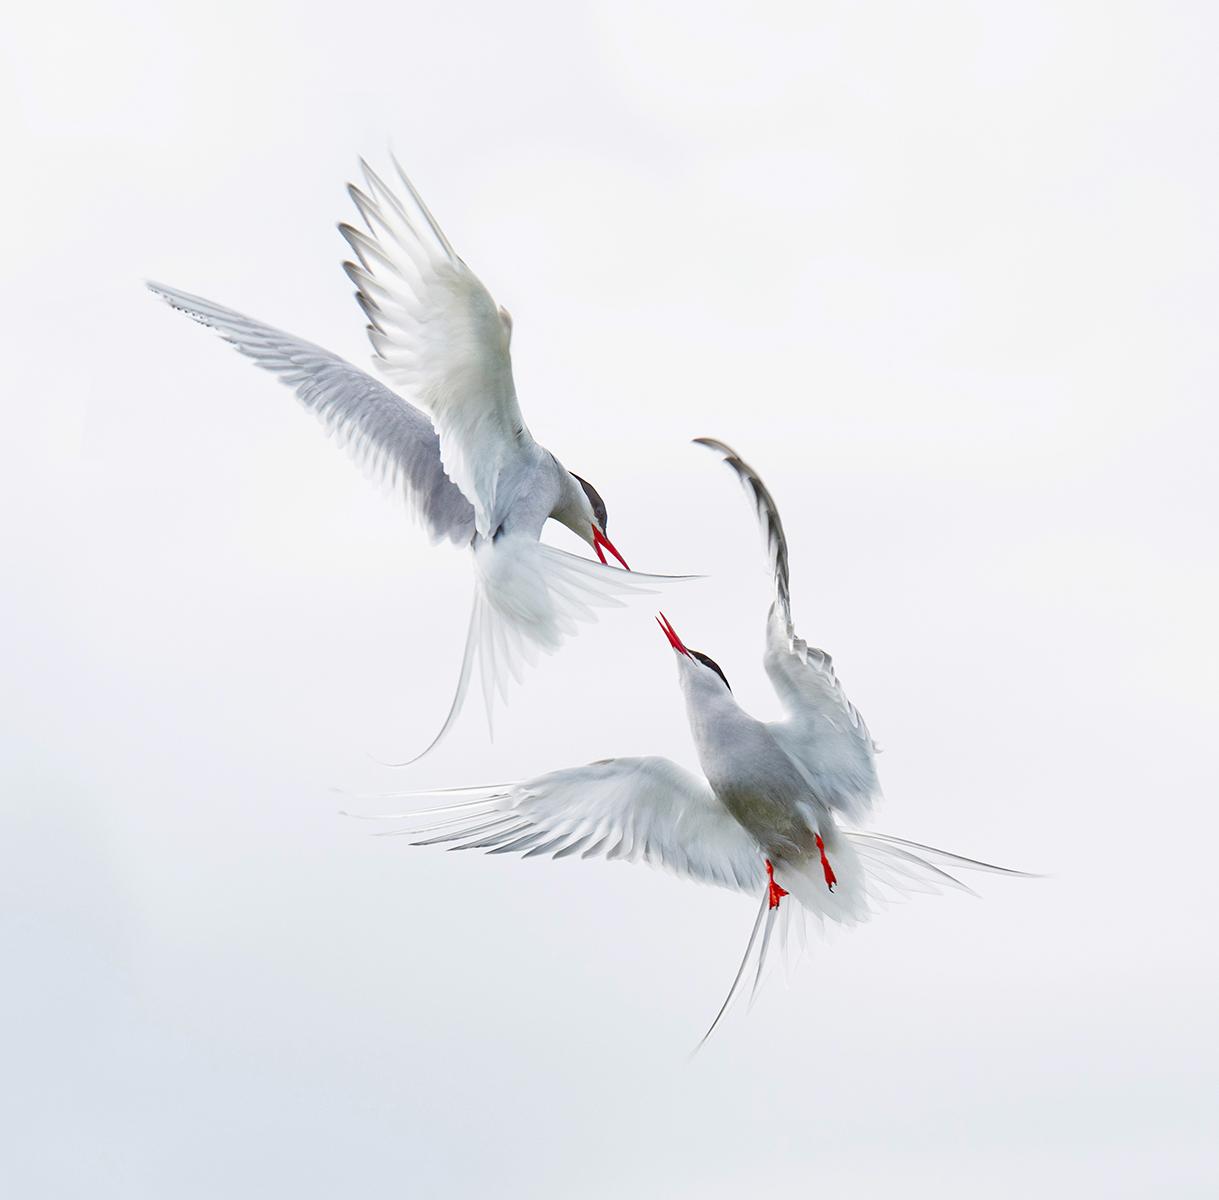 Arctic Terns - Interactions in Flight